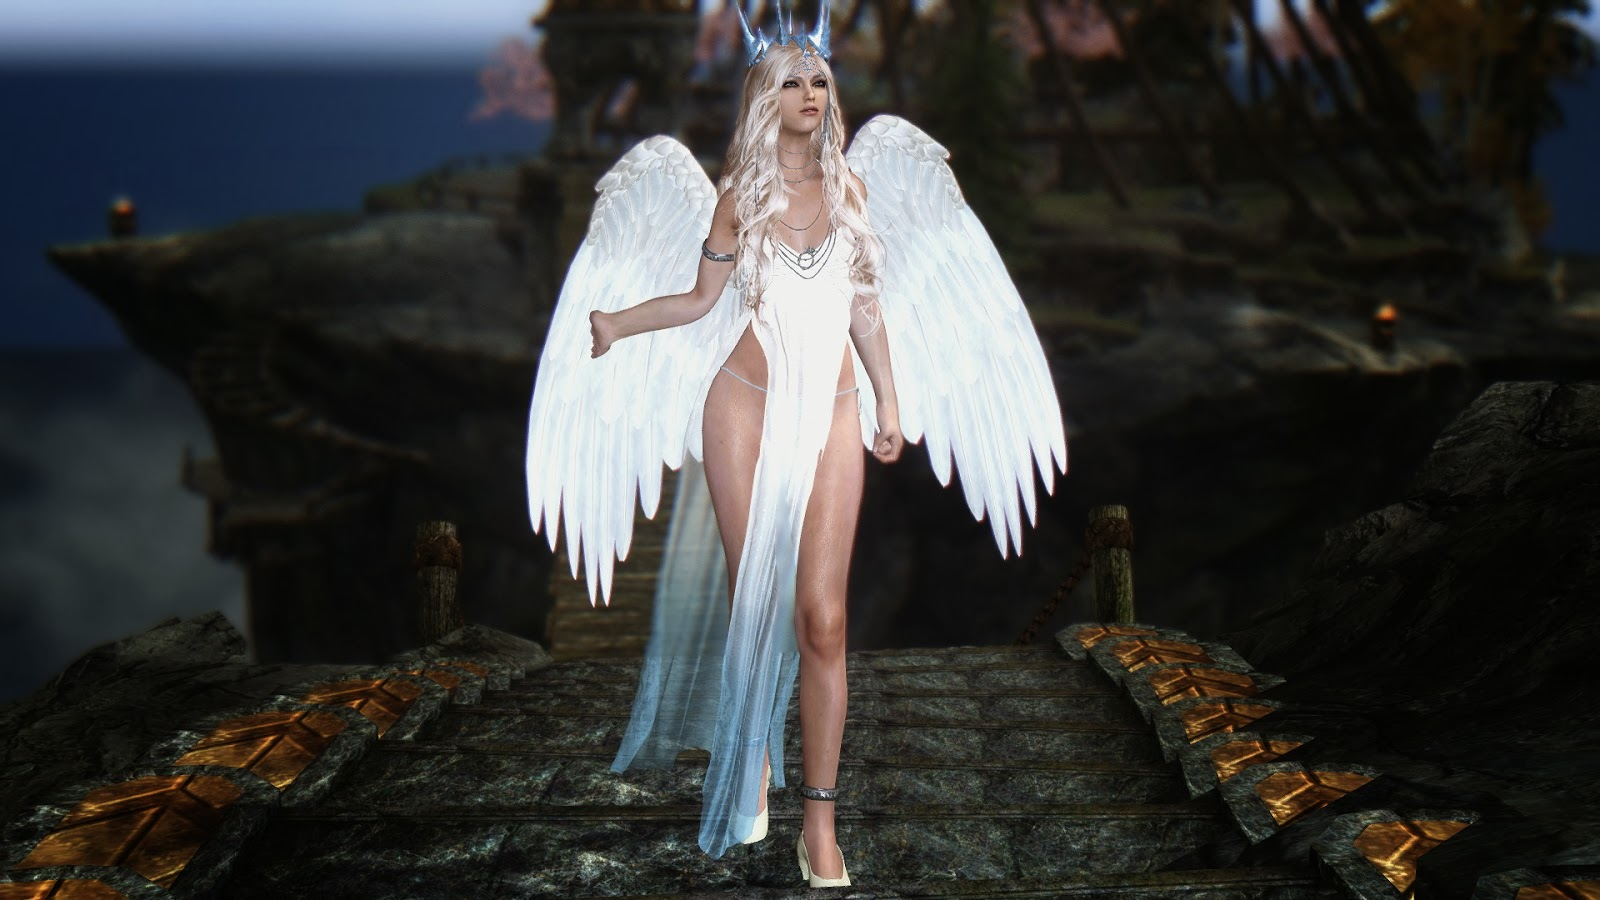 my skyrim images angel